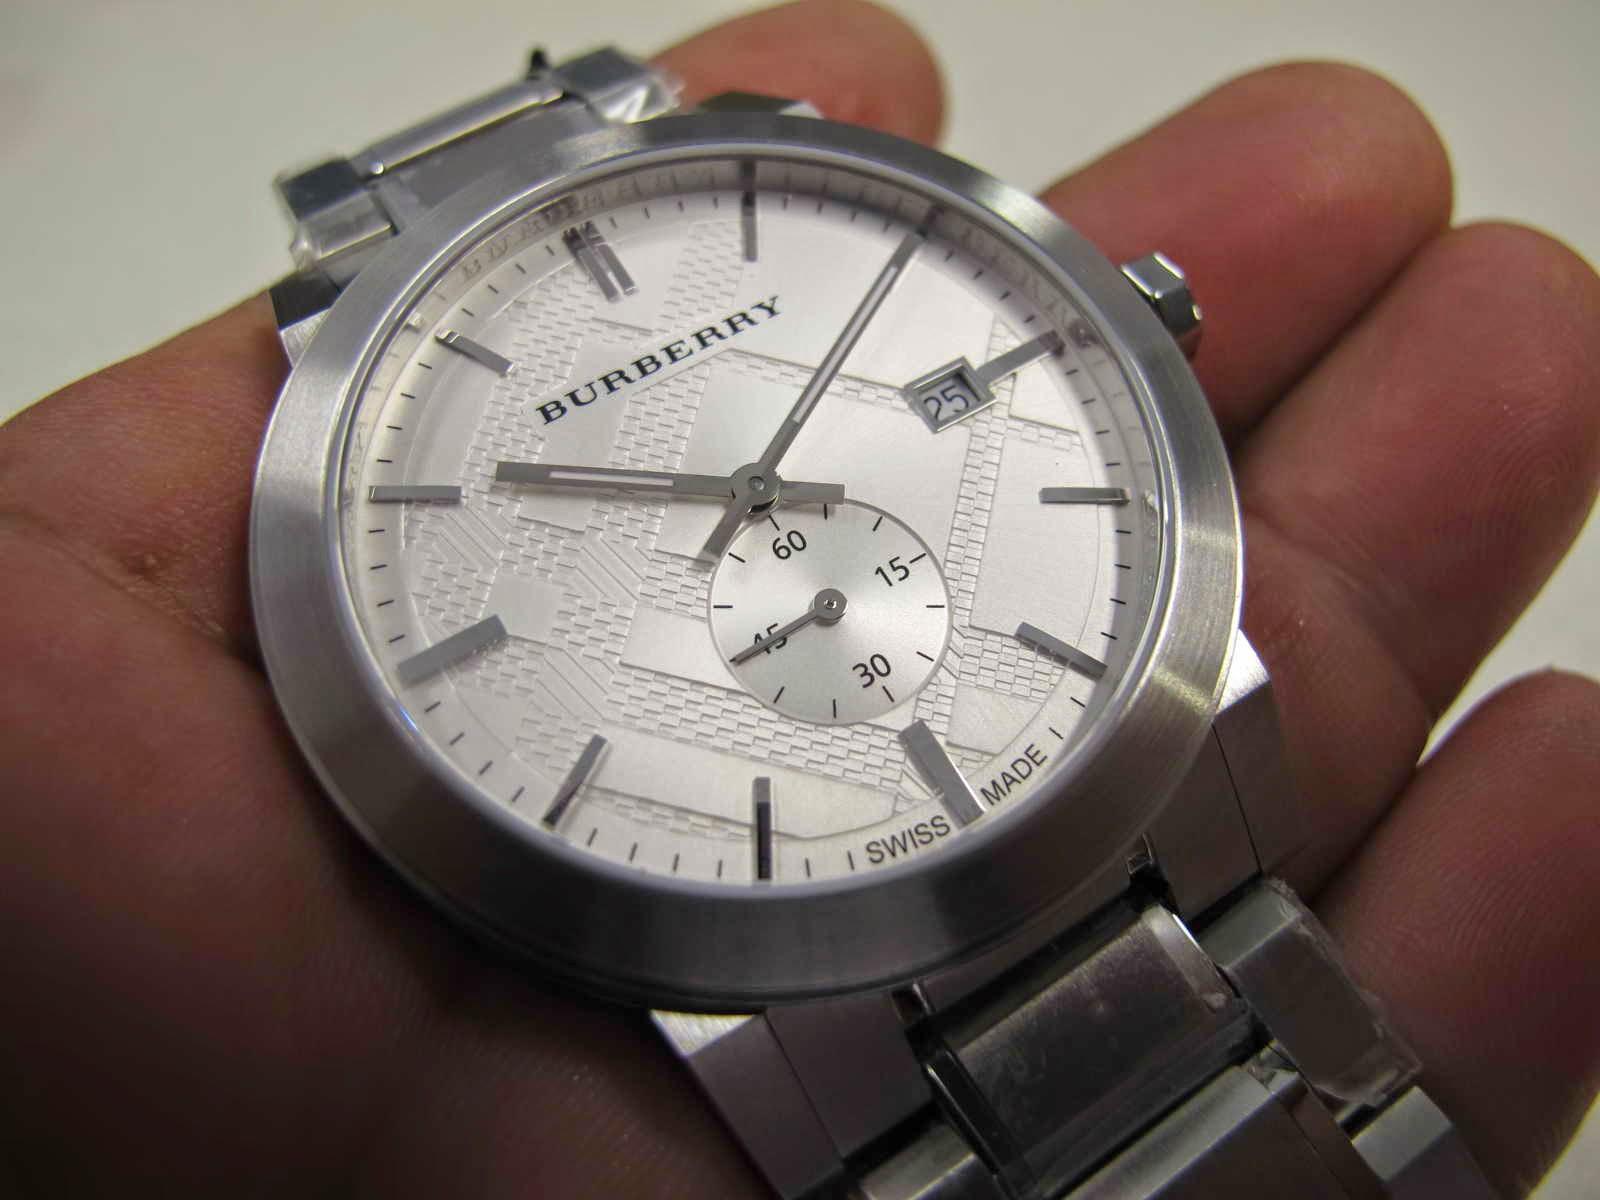 ... lengkap dengan Box dan manualnya... Cocok untuk Anda yang sedang  mencari jam tangan dengan warna dial putih bertekstur.... sub second...  BURBERRY SUB ... bc01d3cc8c